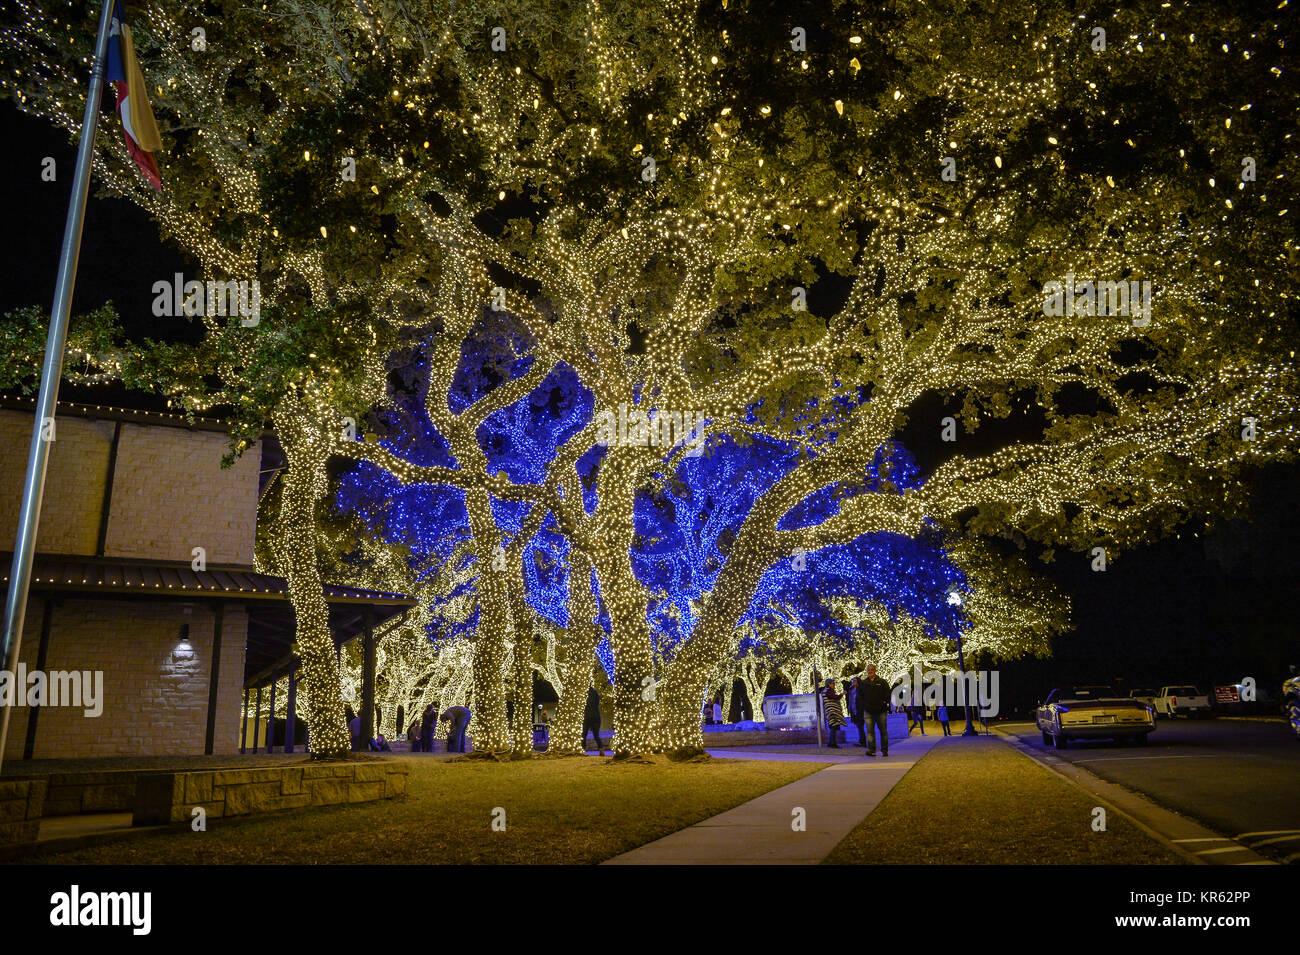 Johnson City, USA. 18 Dec, 2017. For the past 28 years Johnson City ...